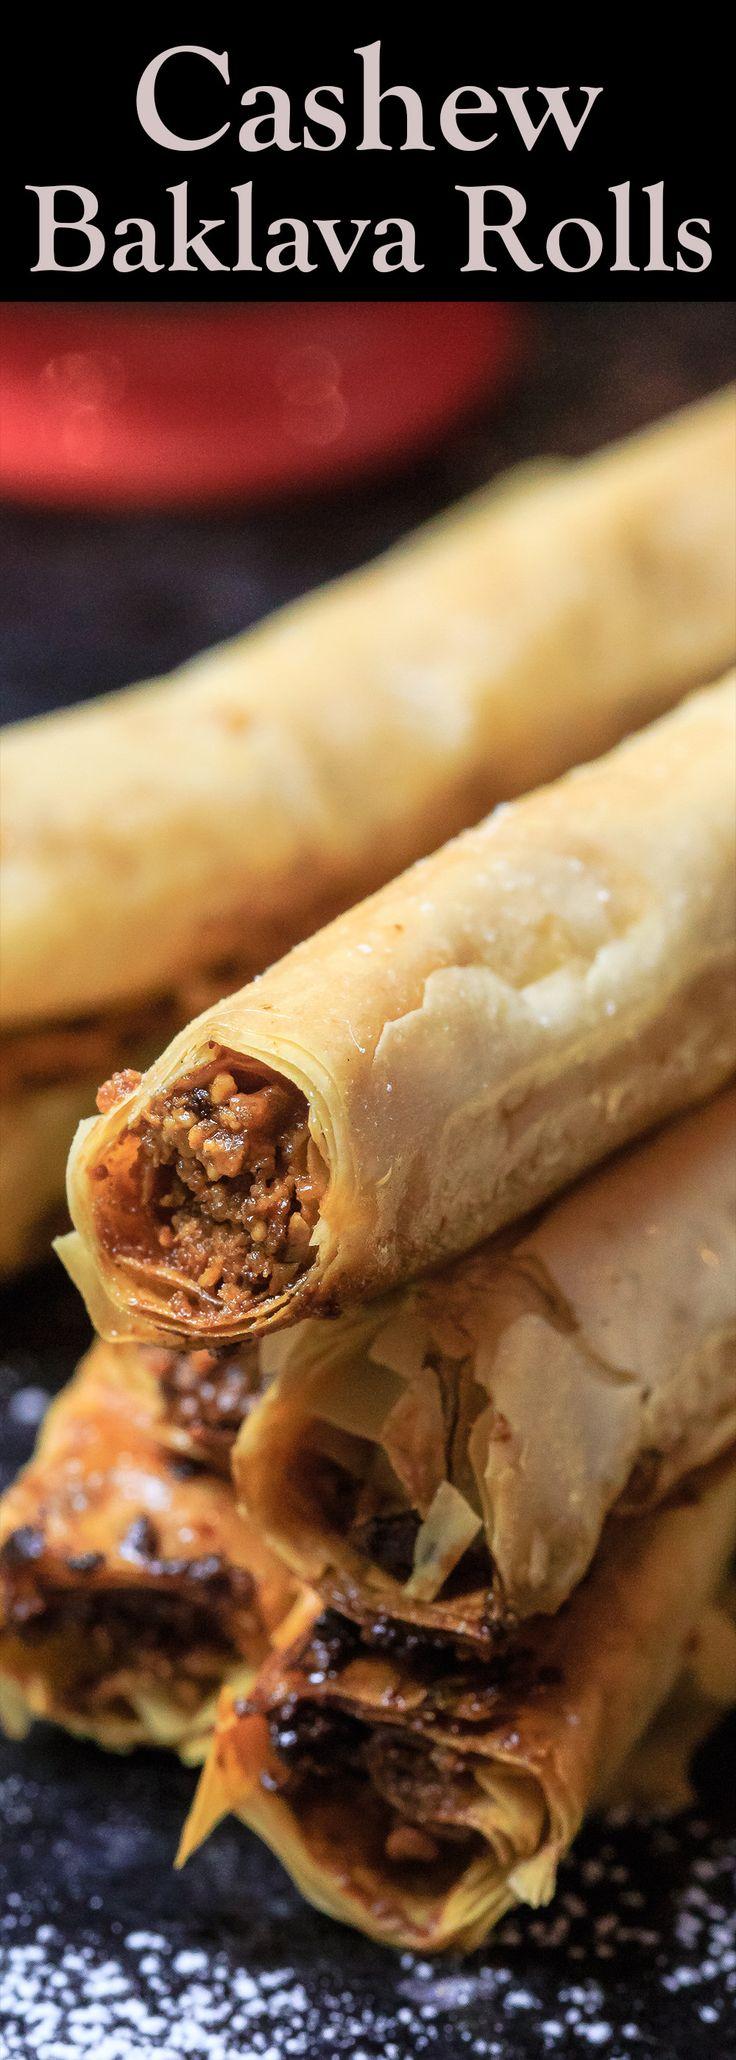 Cashew Filled Baklava Rolls | The Mediterranean Dish.